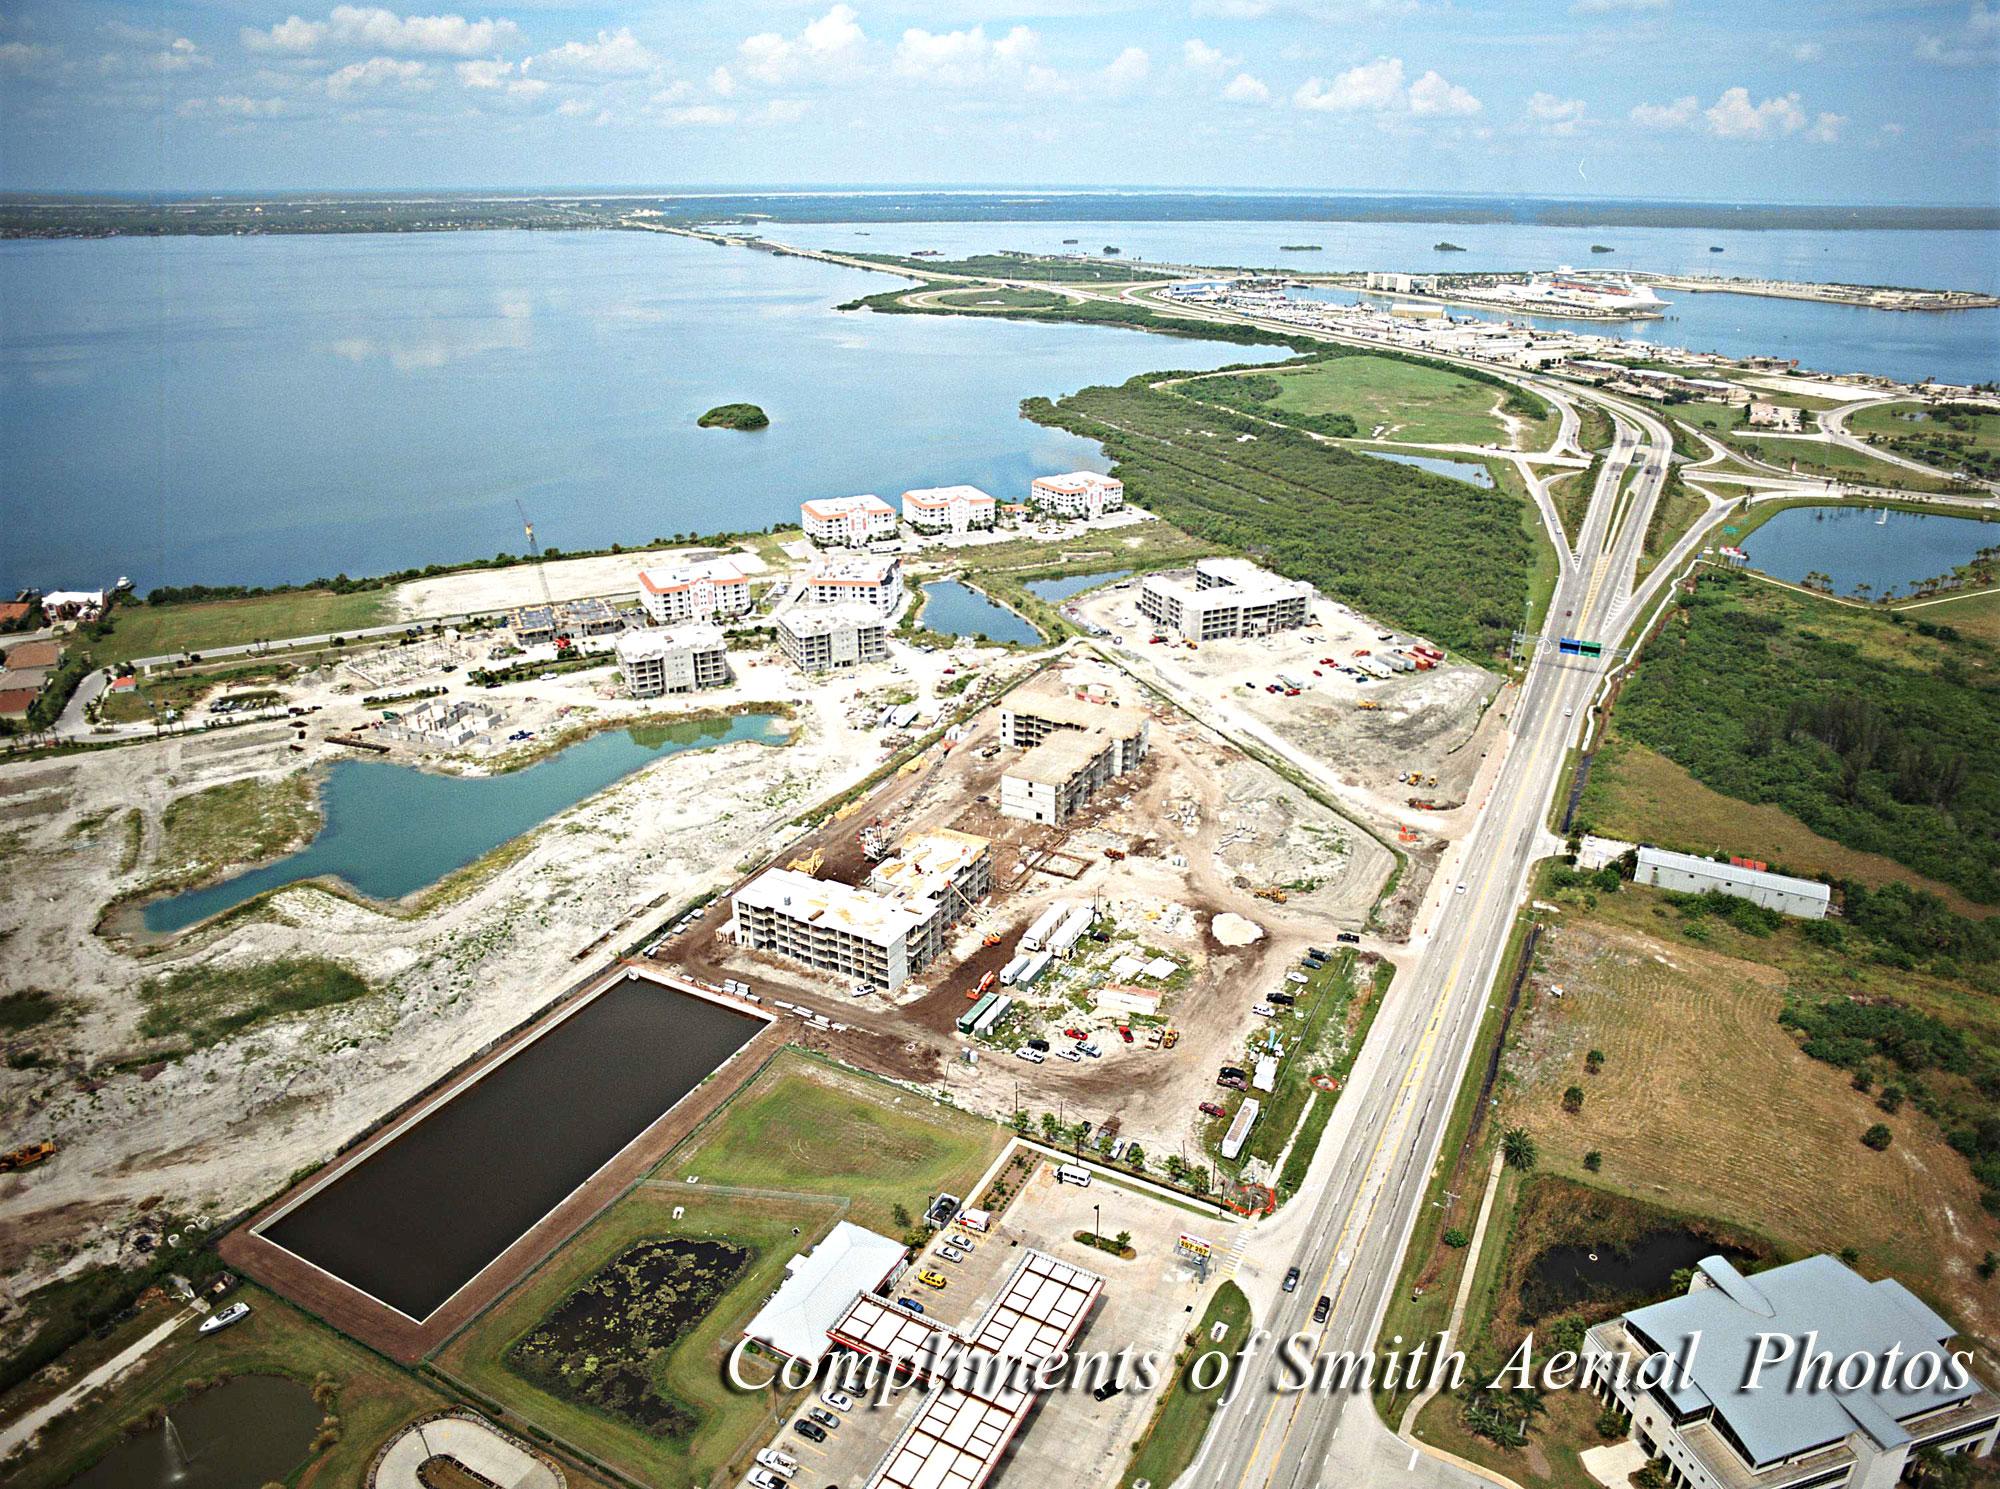 Cape Canaveral Insurance | Capecanaveralinsurance's Blog